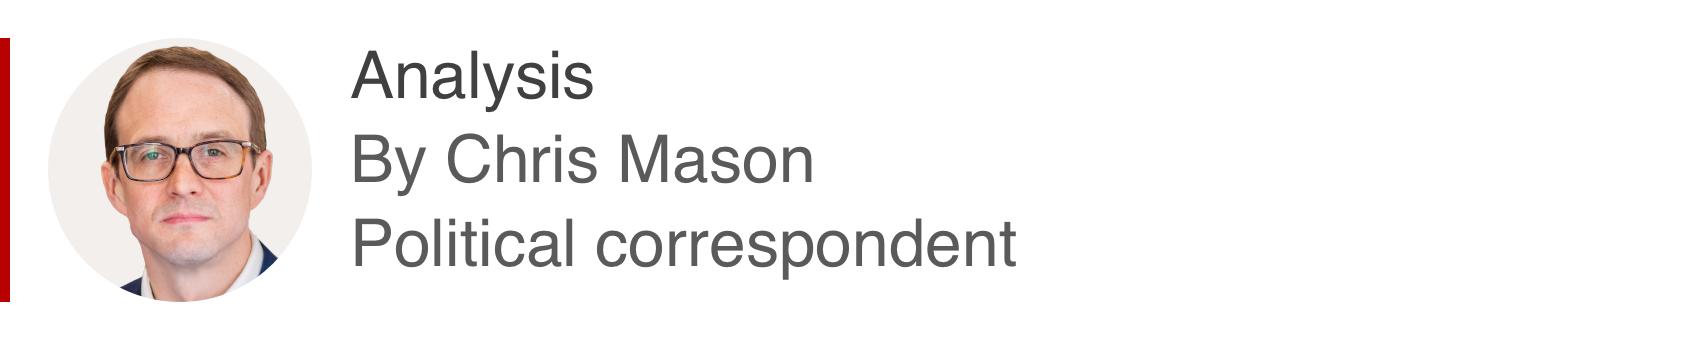 Analysis box by Chris Mason, political correspondent